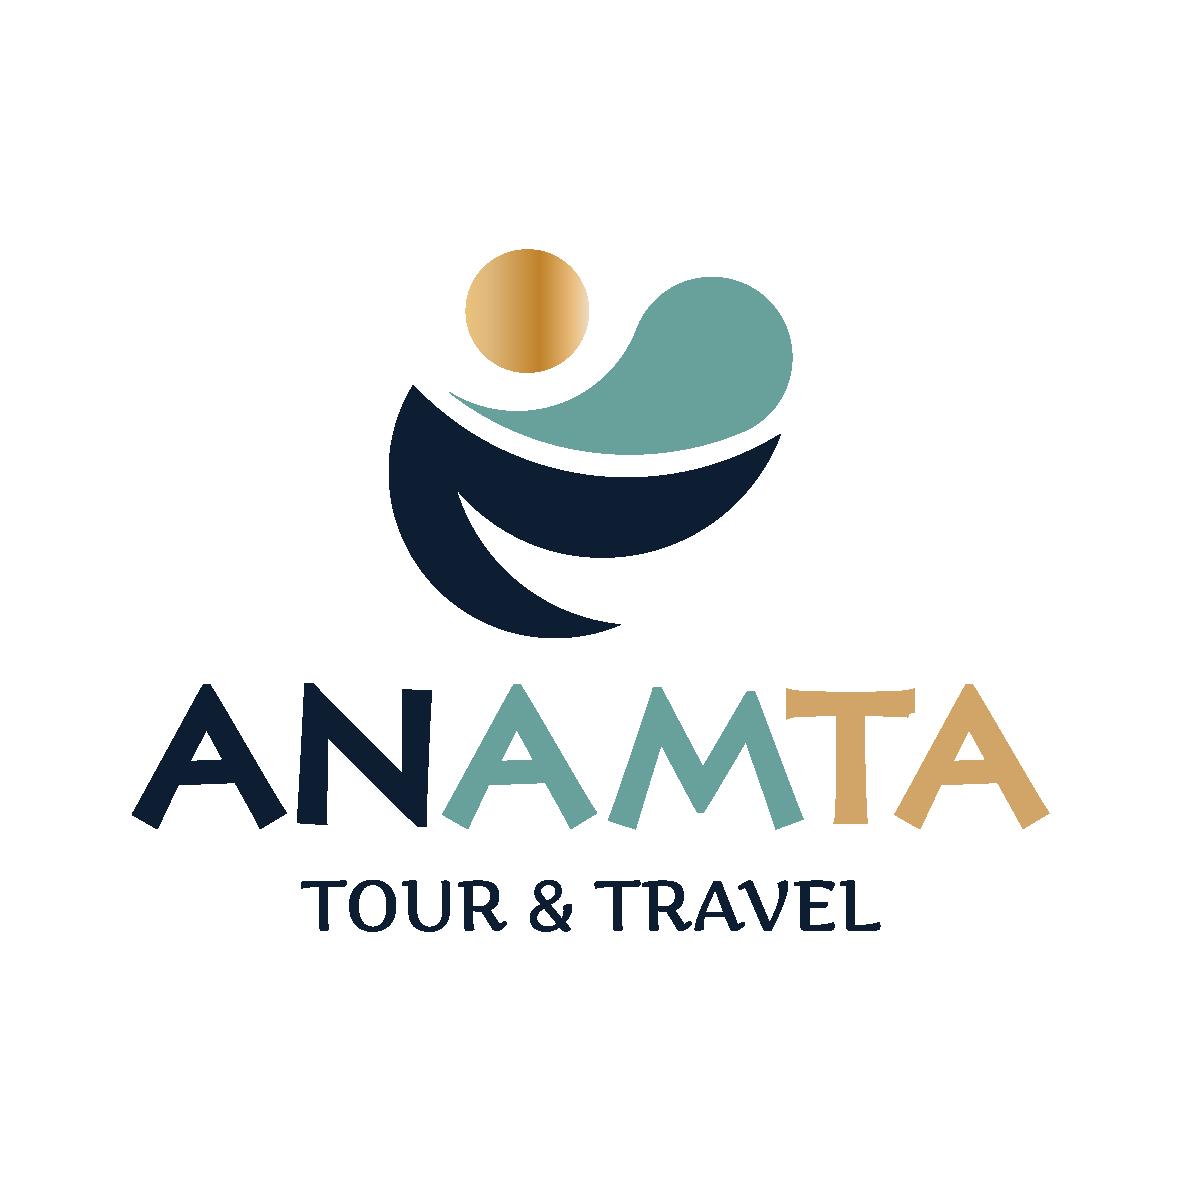 ANAMTA